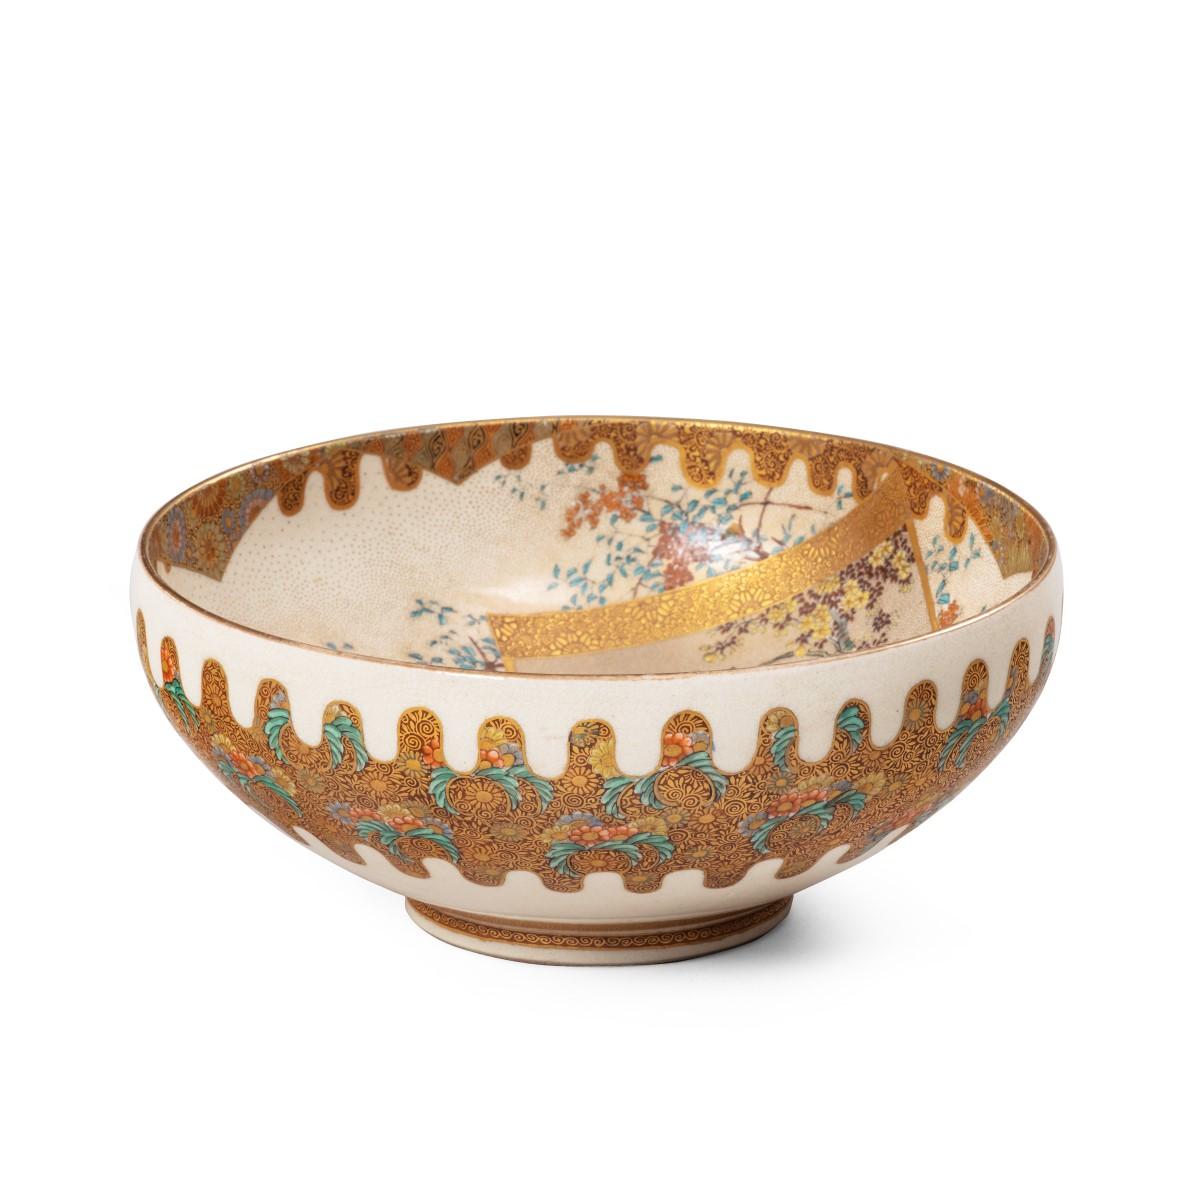 A Meiji period Satsuma earthenware bowl